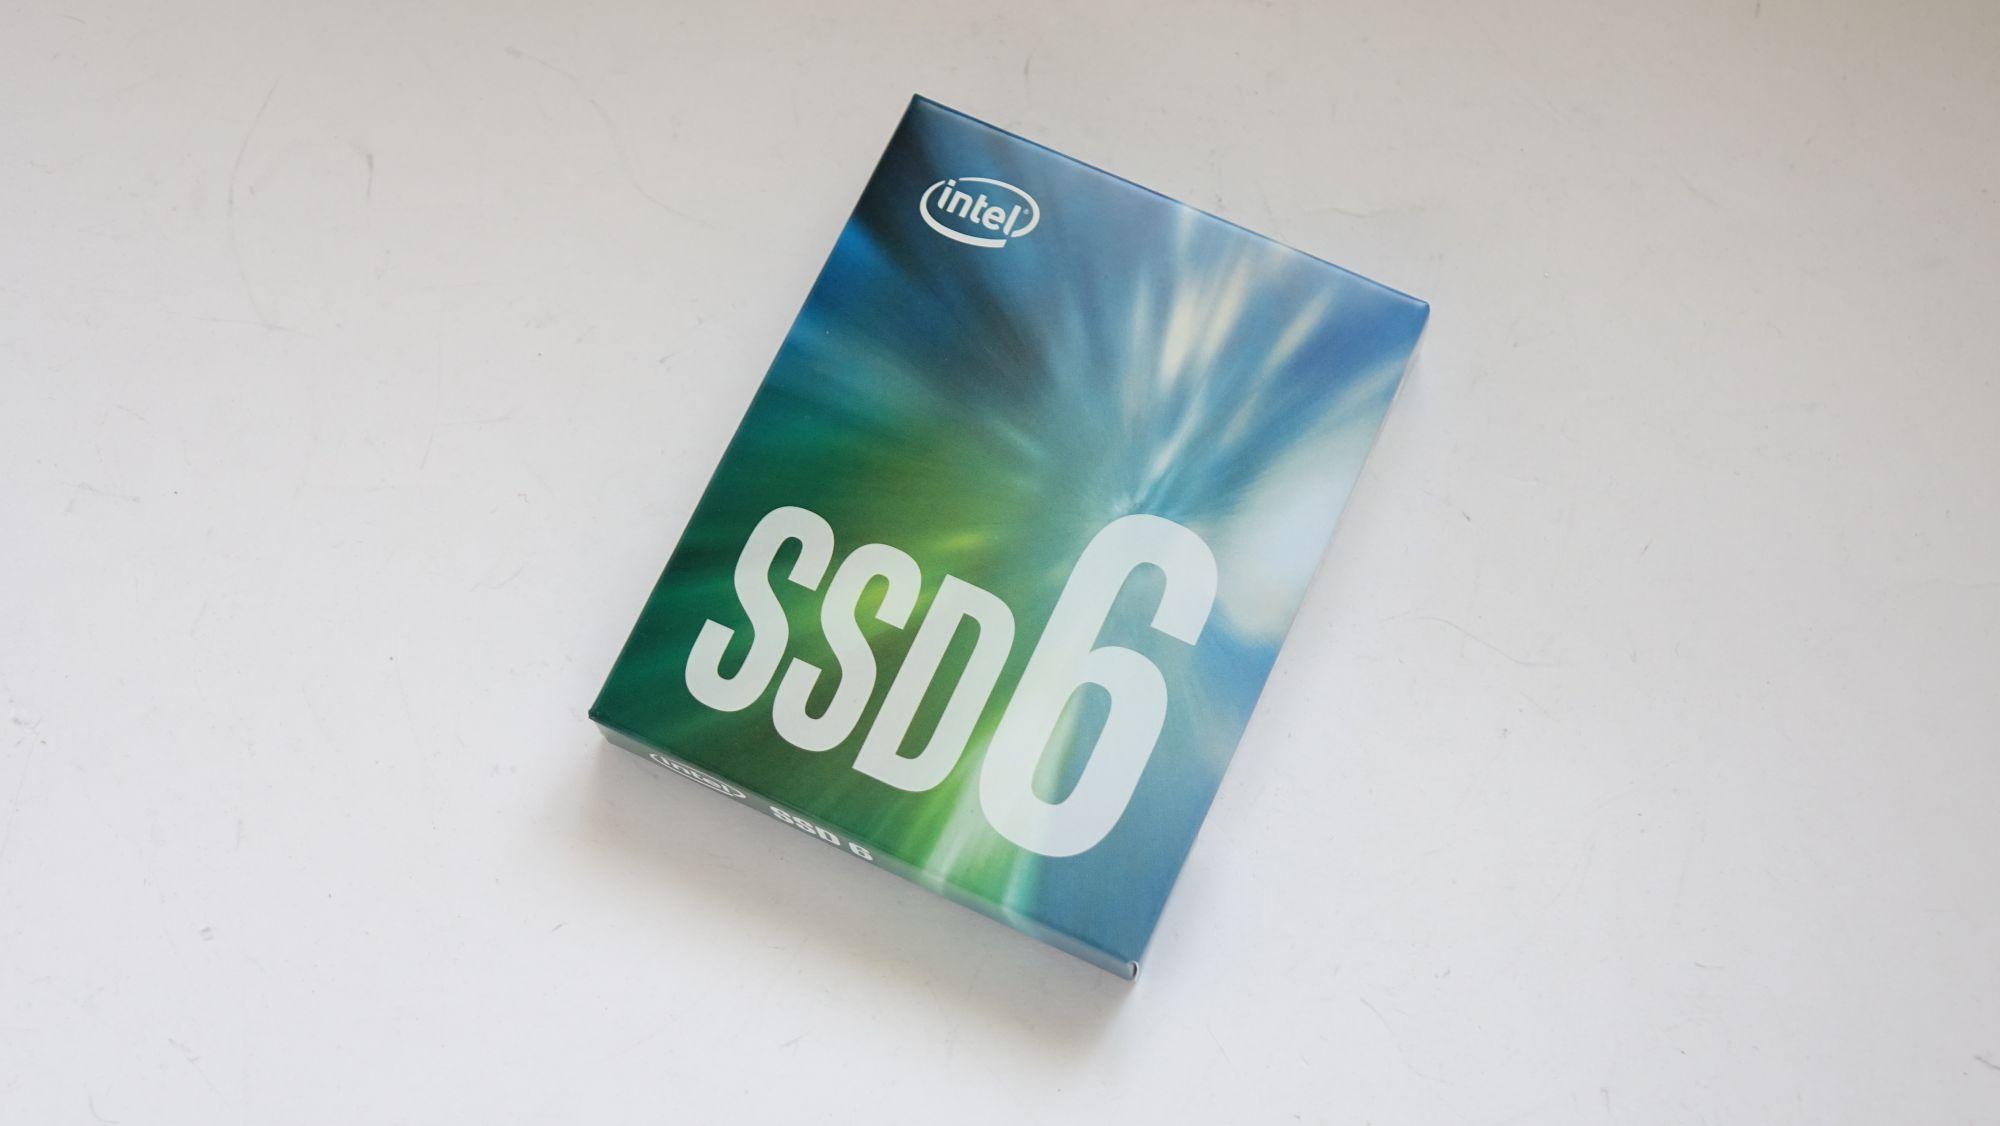 Intel SSD 600p 512 Гбайт упаковка